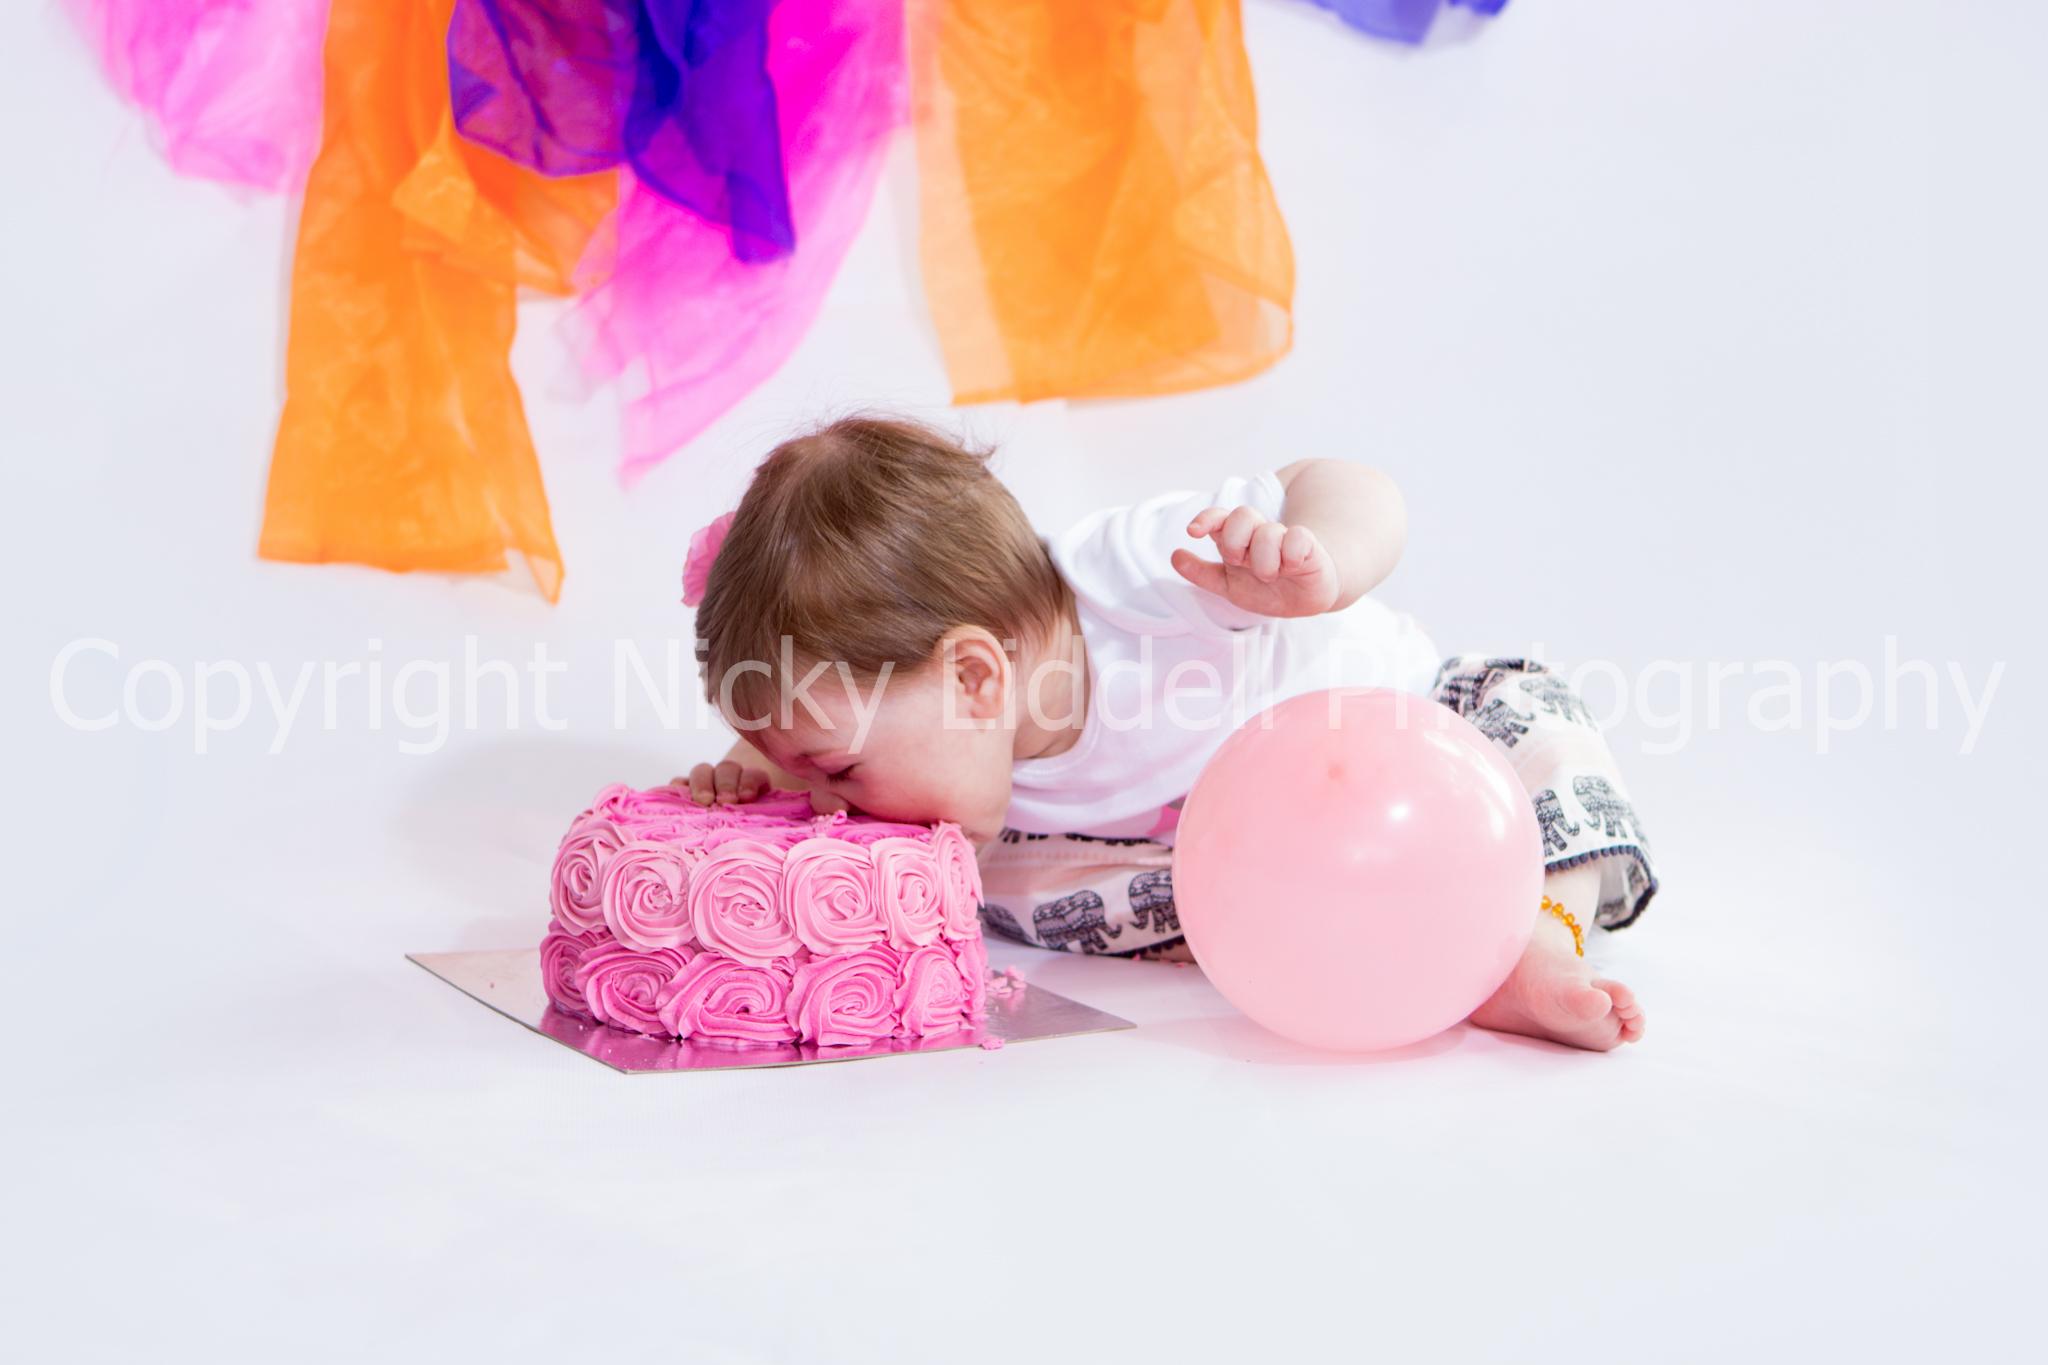 amelia cake-23